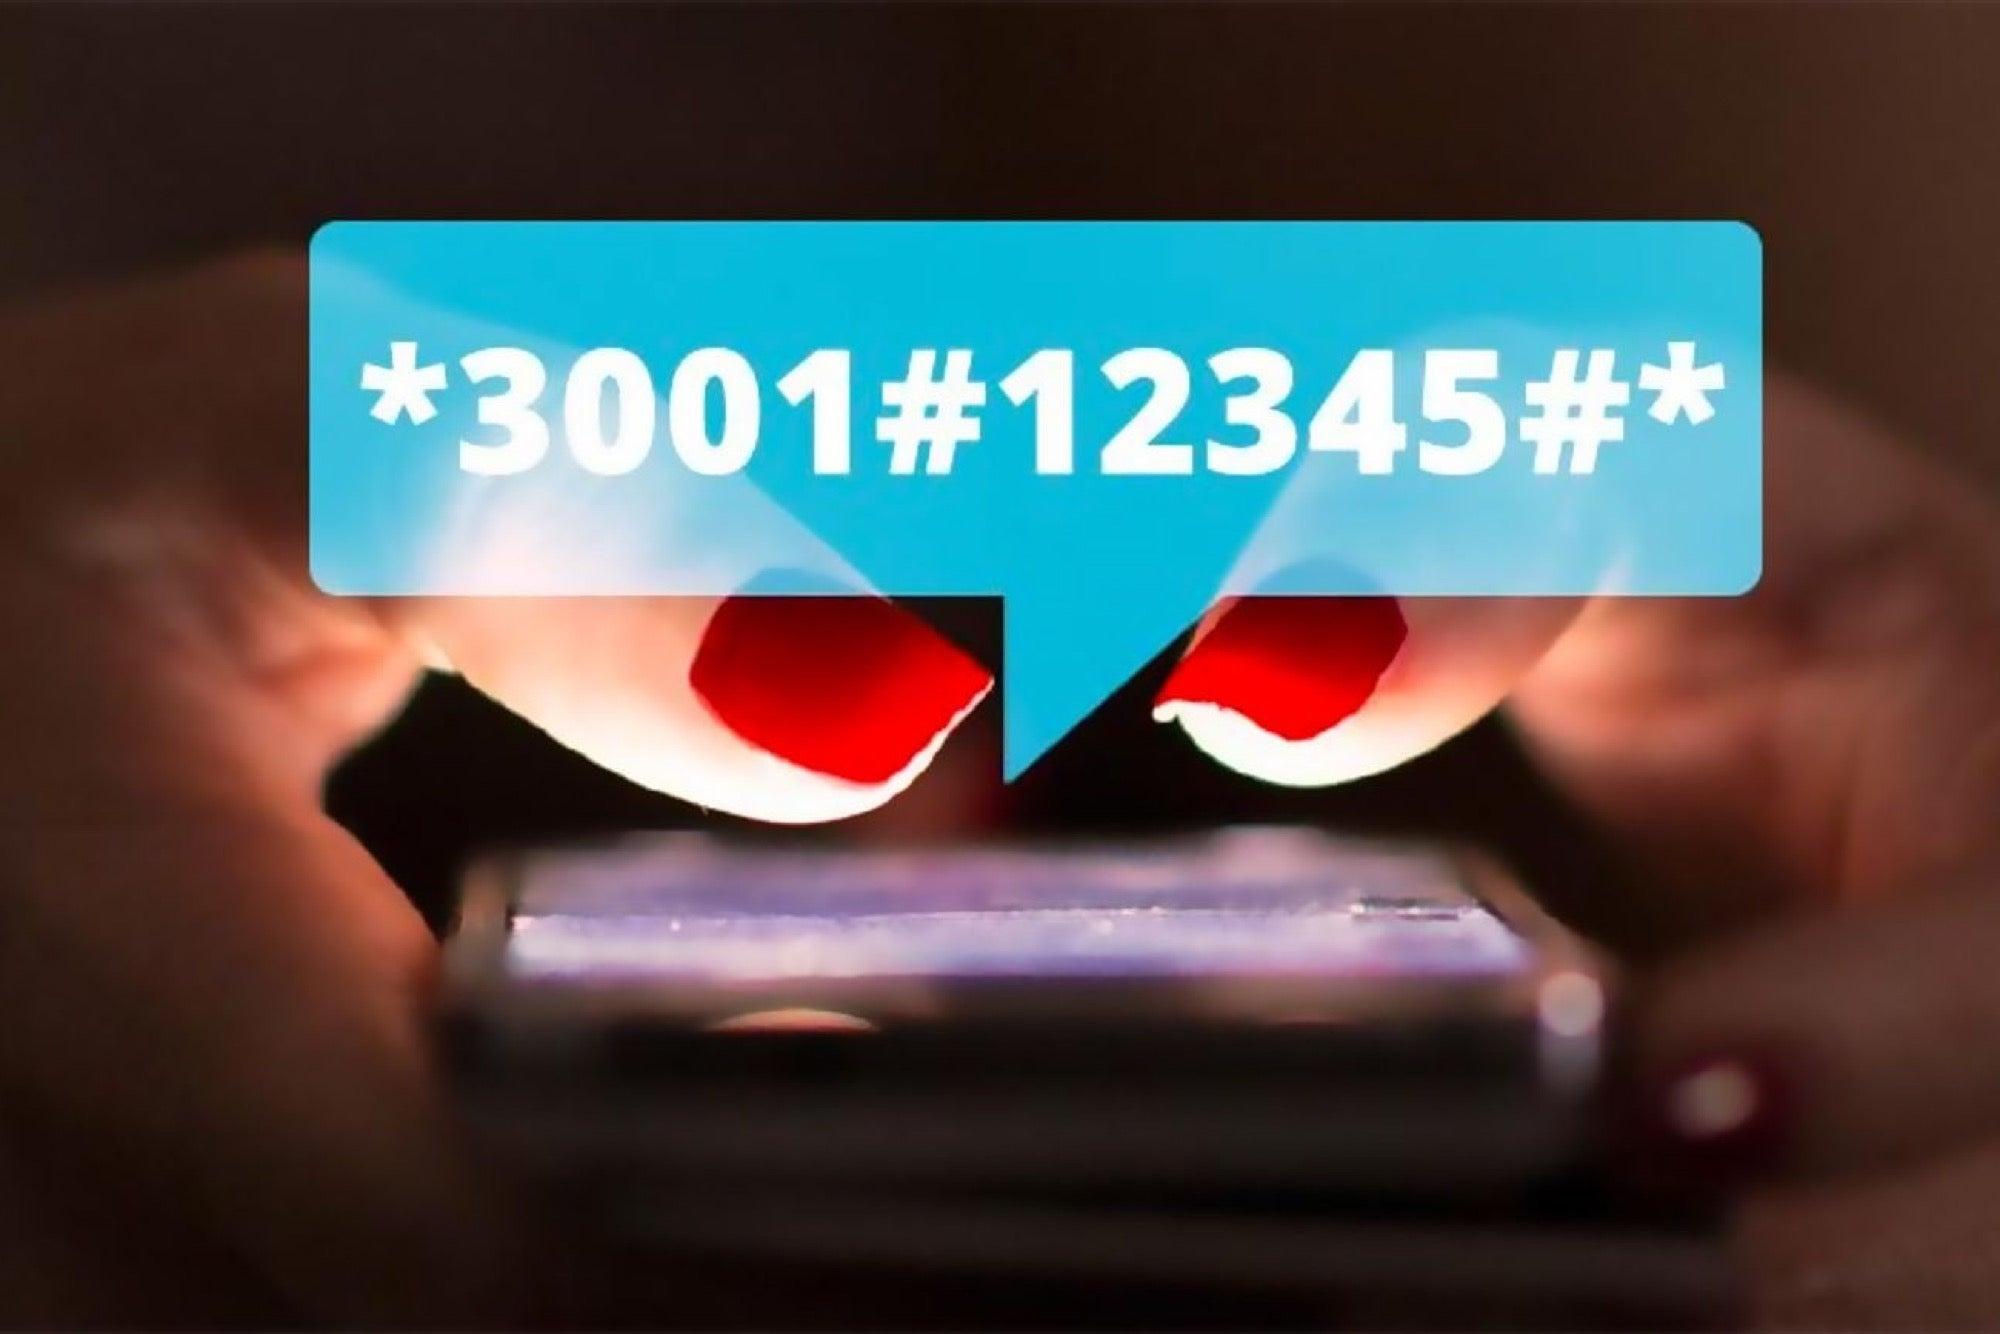 Some Of The Best Unlock Hidden Smartphone Features With Secret Codes